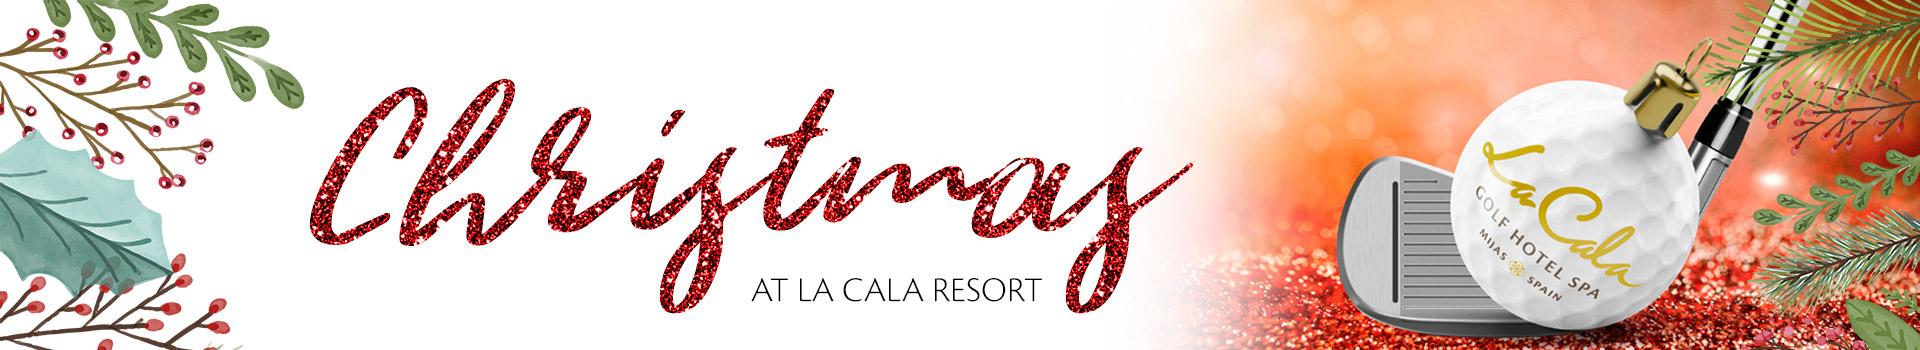 Celebrate Christmas time at La Cala Resort